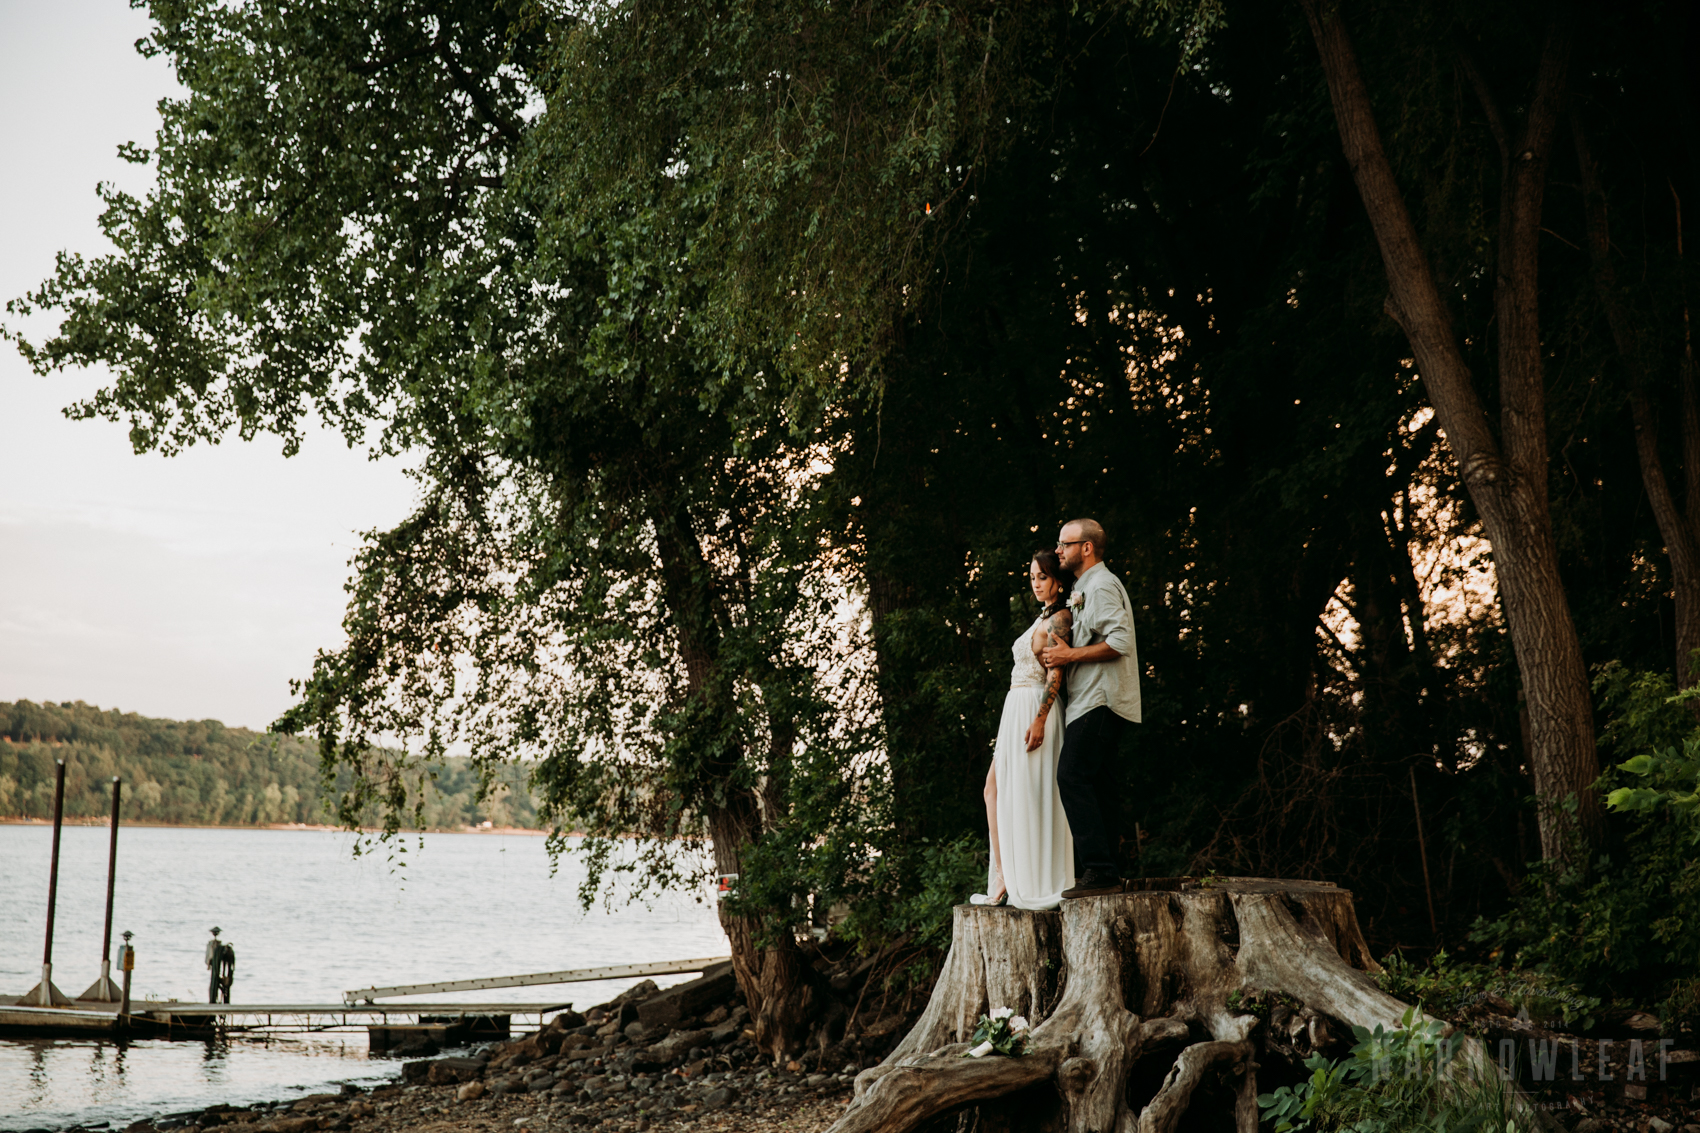 minnesota-outdoor-wedding-elopement-NarrowLeaf_Love_&_Adventure_Photography-24.jpg